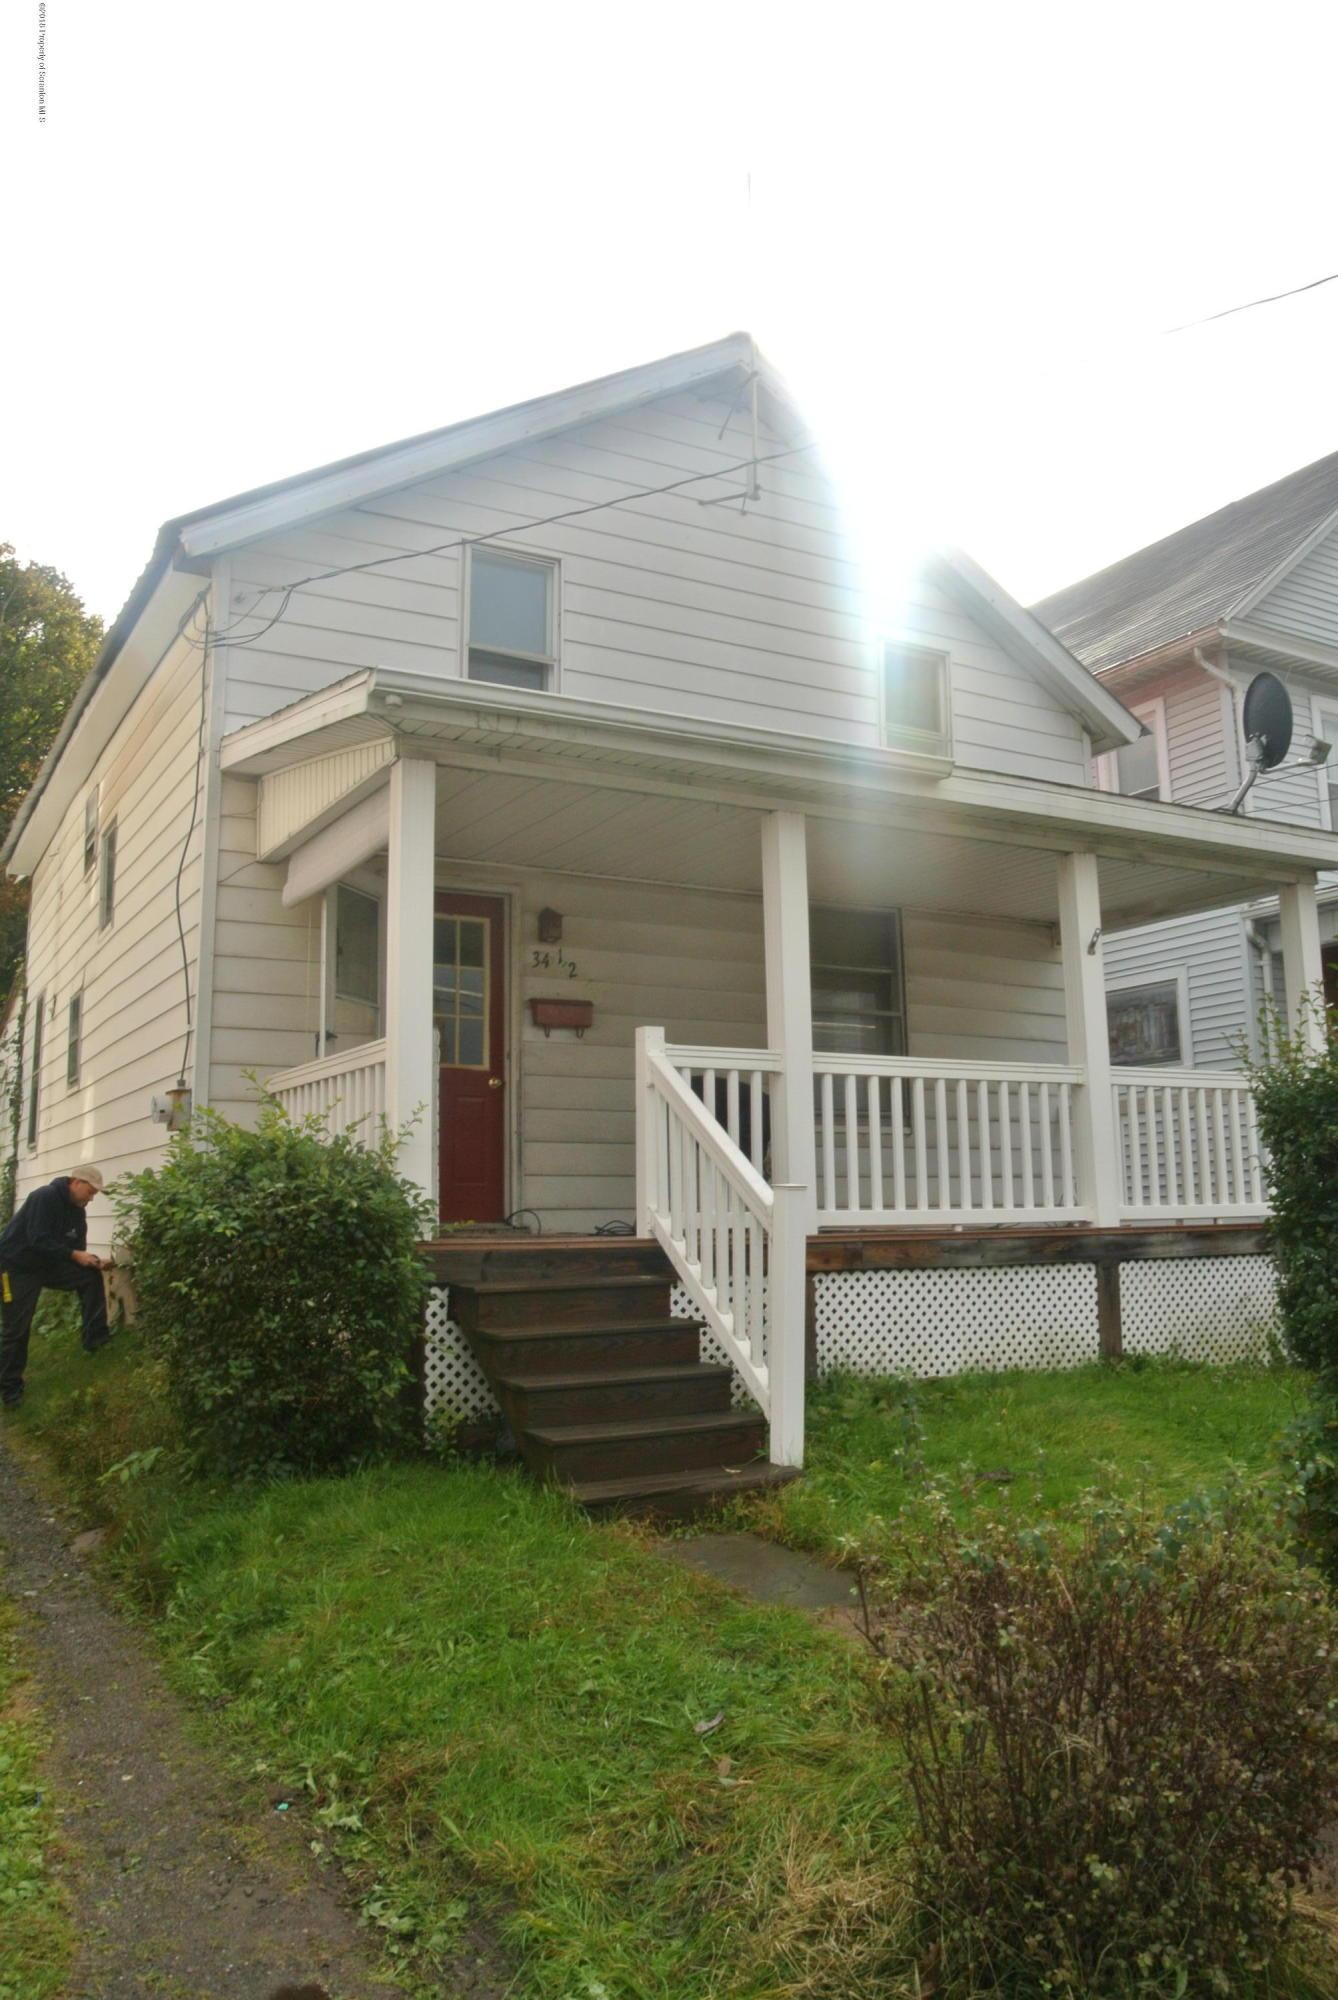 34 Belmont St, Carbondale, Pennsylvania 18407, 2 Bedrooms Bedrooms, 6 Rooms Rooms,1 BathroomBathrooms,Single Family,For Sale,Belmont,18-5205